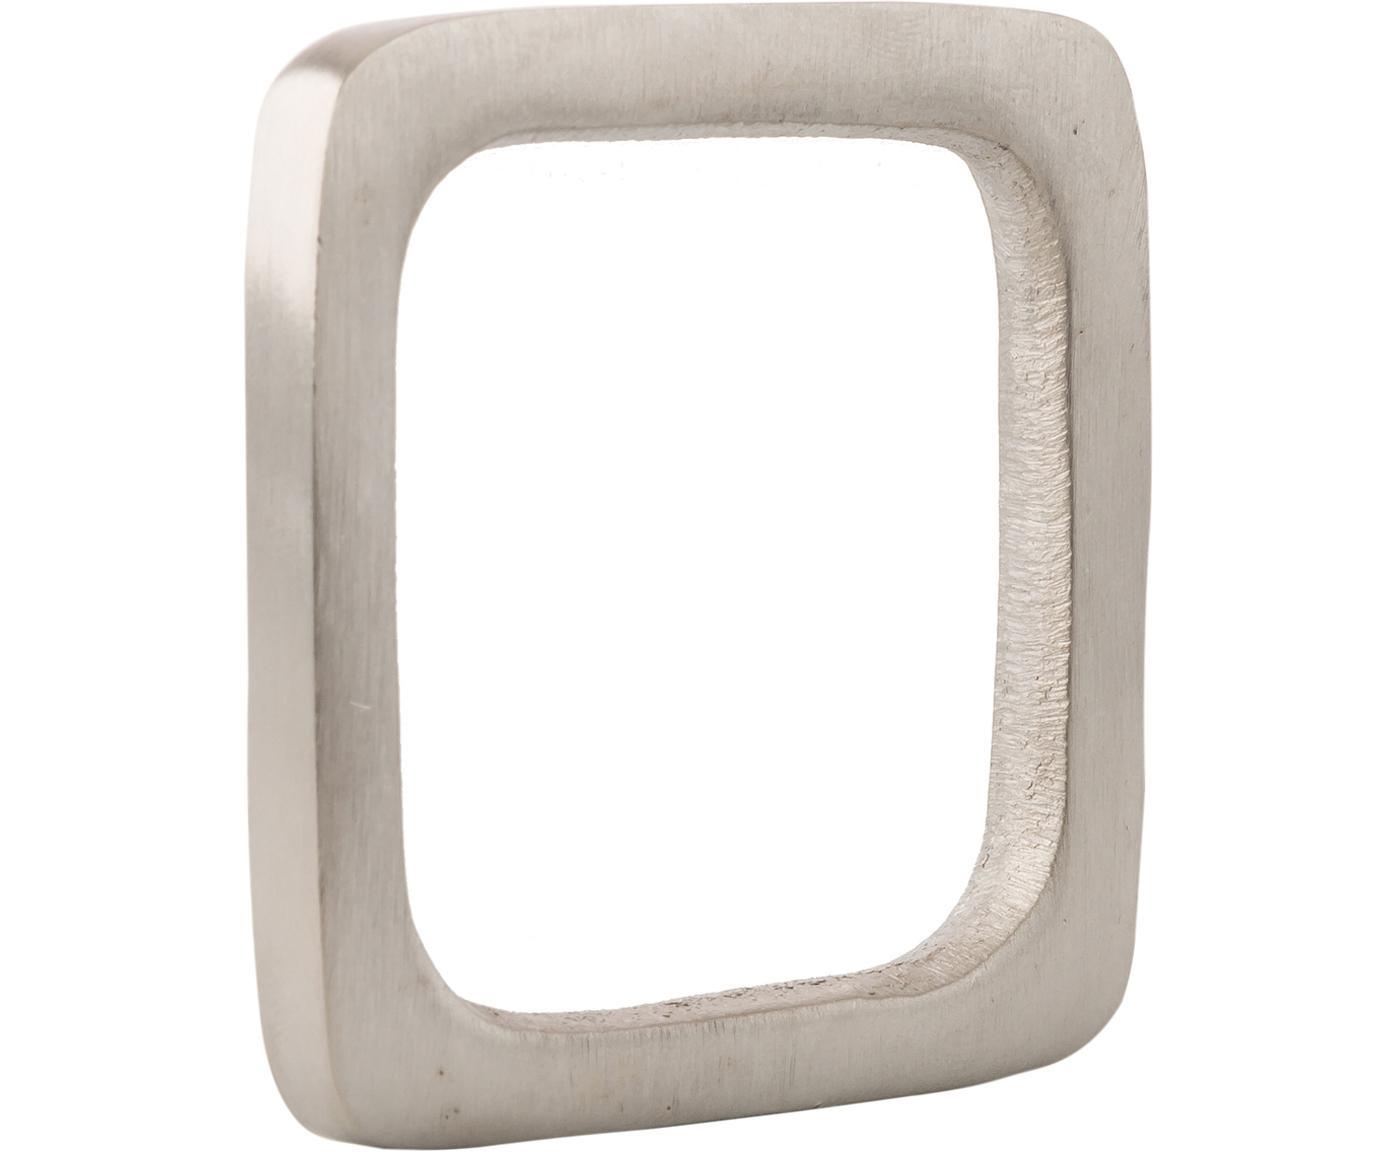 Servilleteros Squark, 4uds., Aluminio, niquelado, Níquel, An 5 x L 5 cm